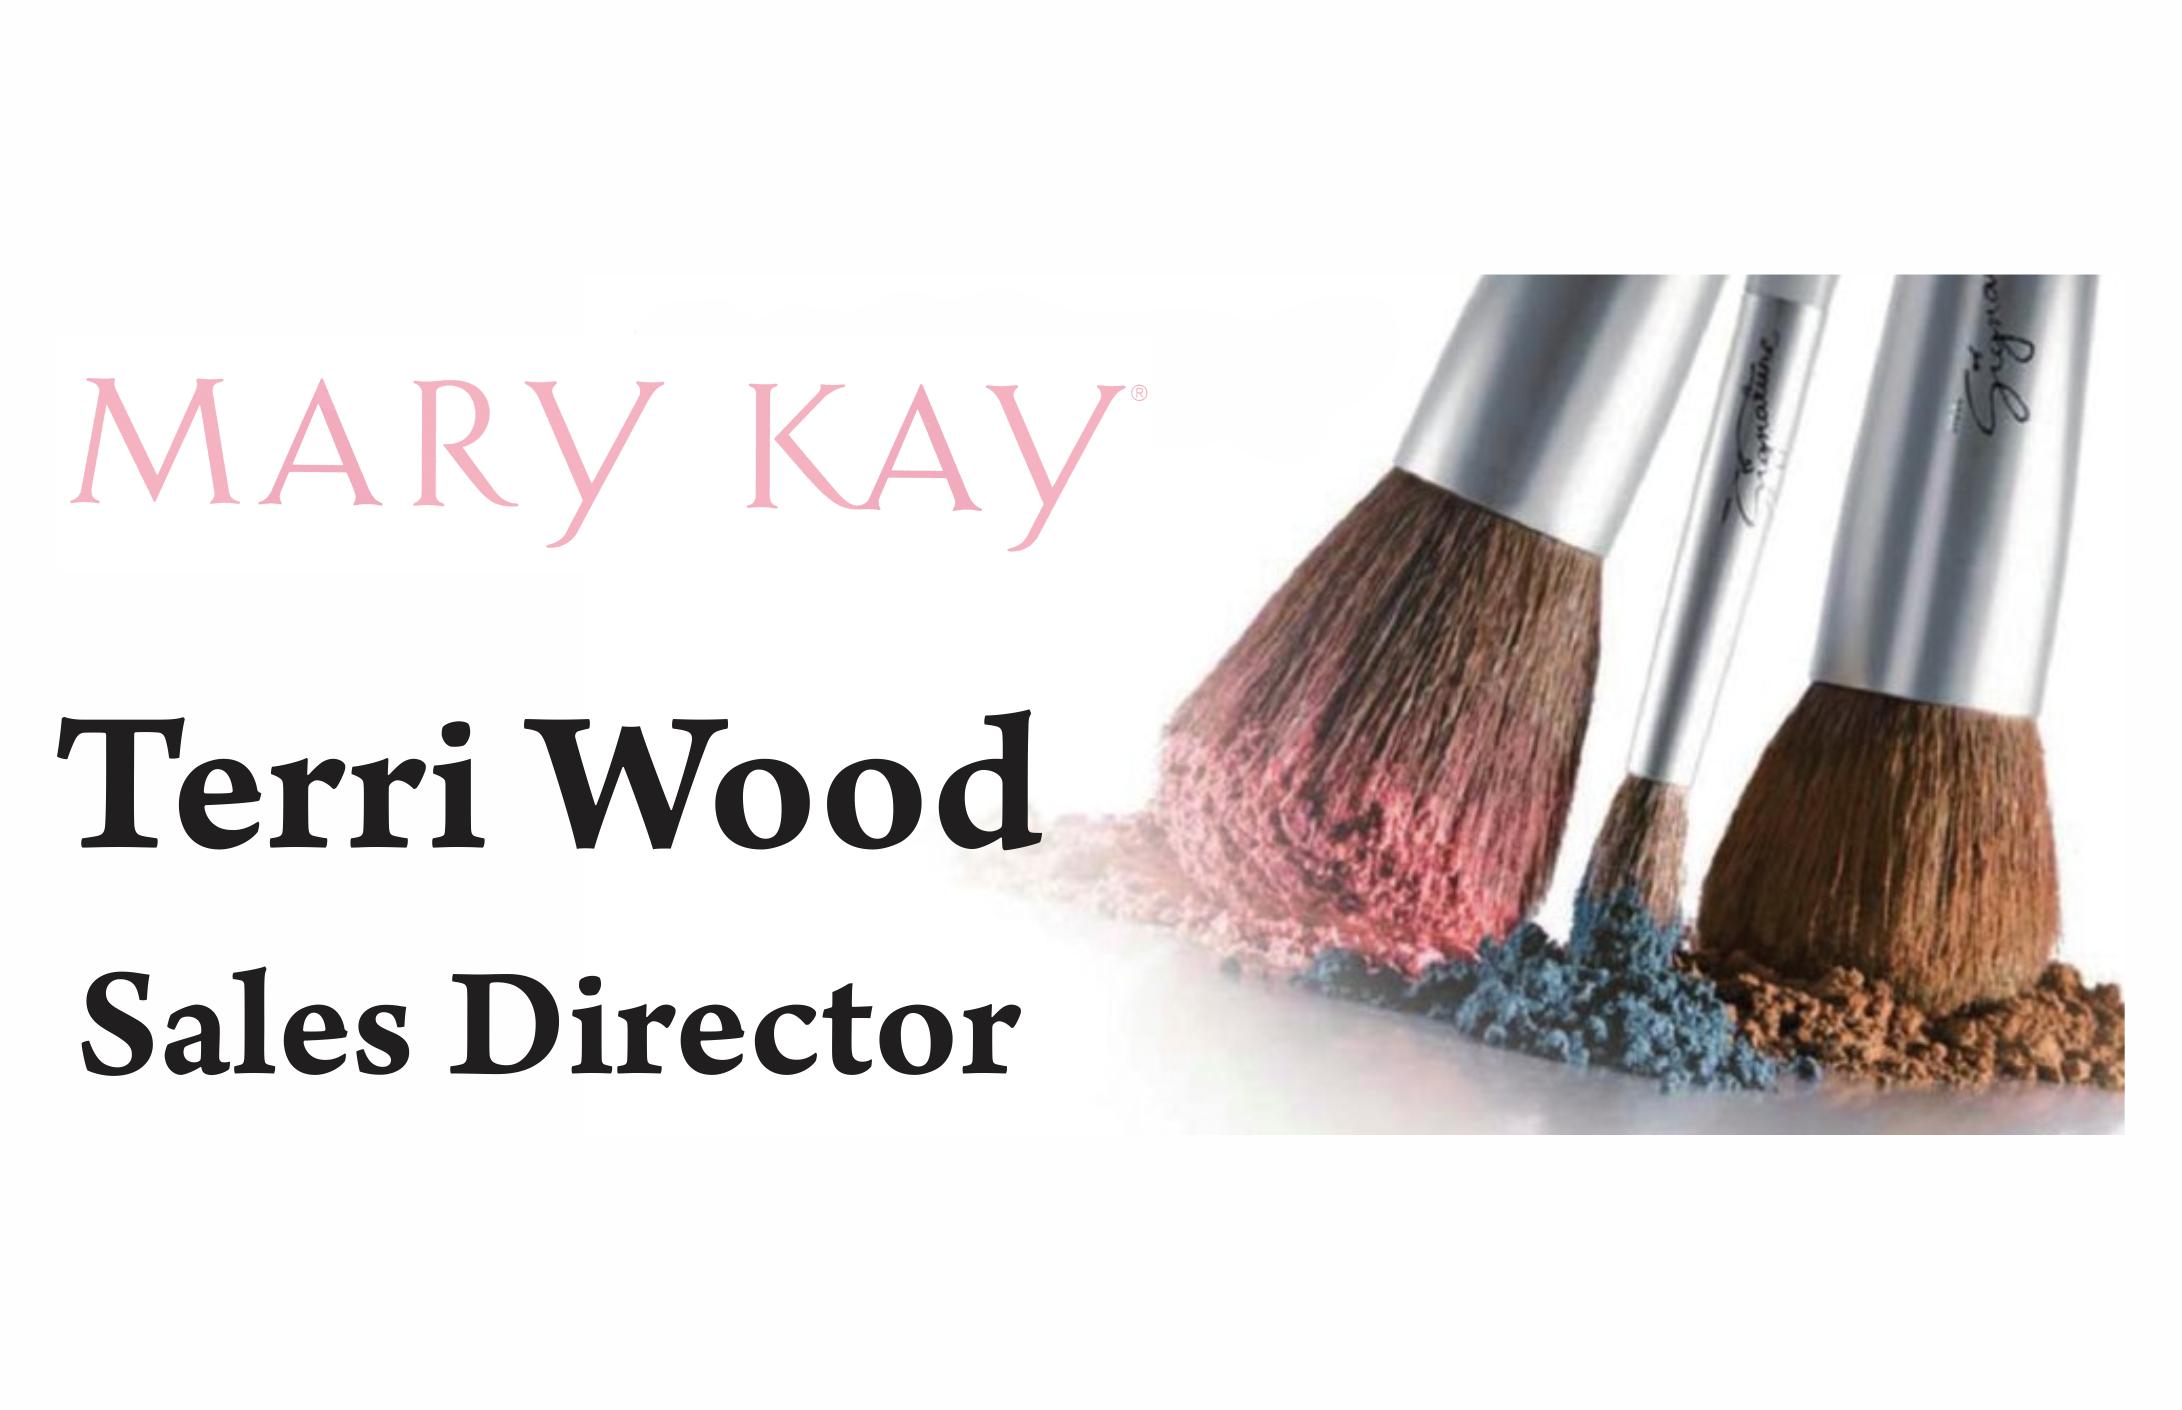 Terri Wood, Mary Kay